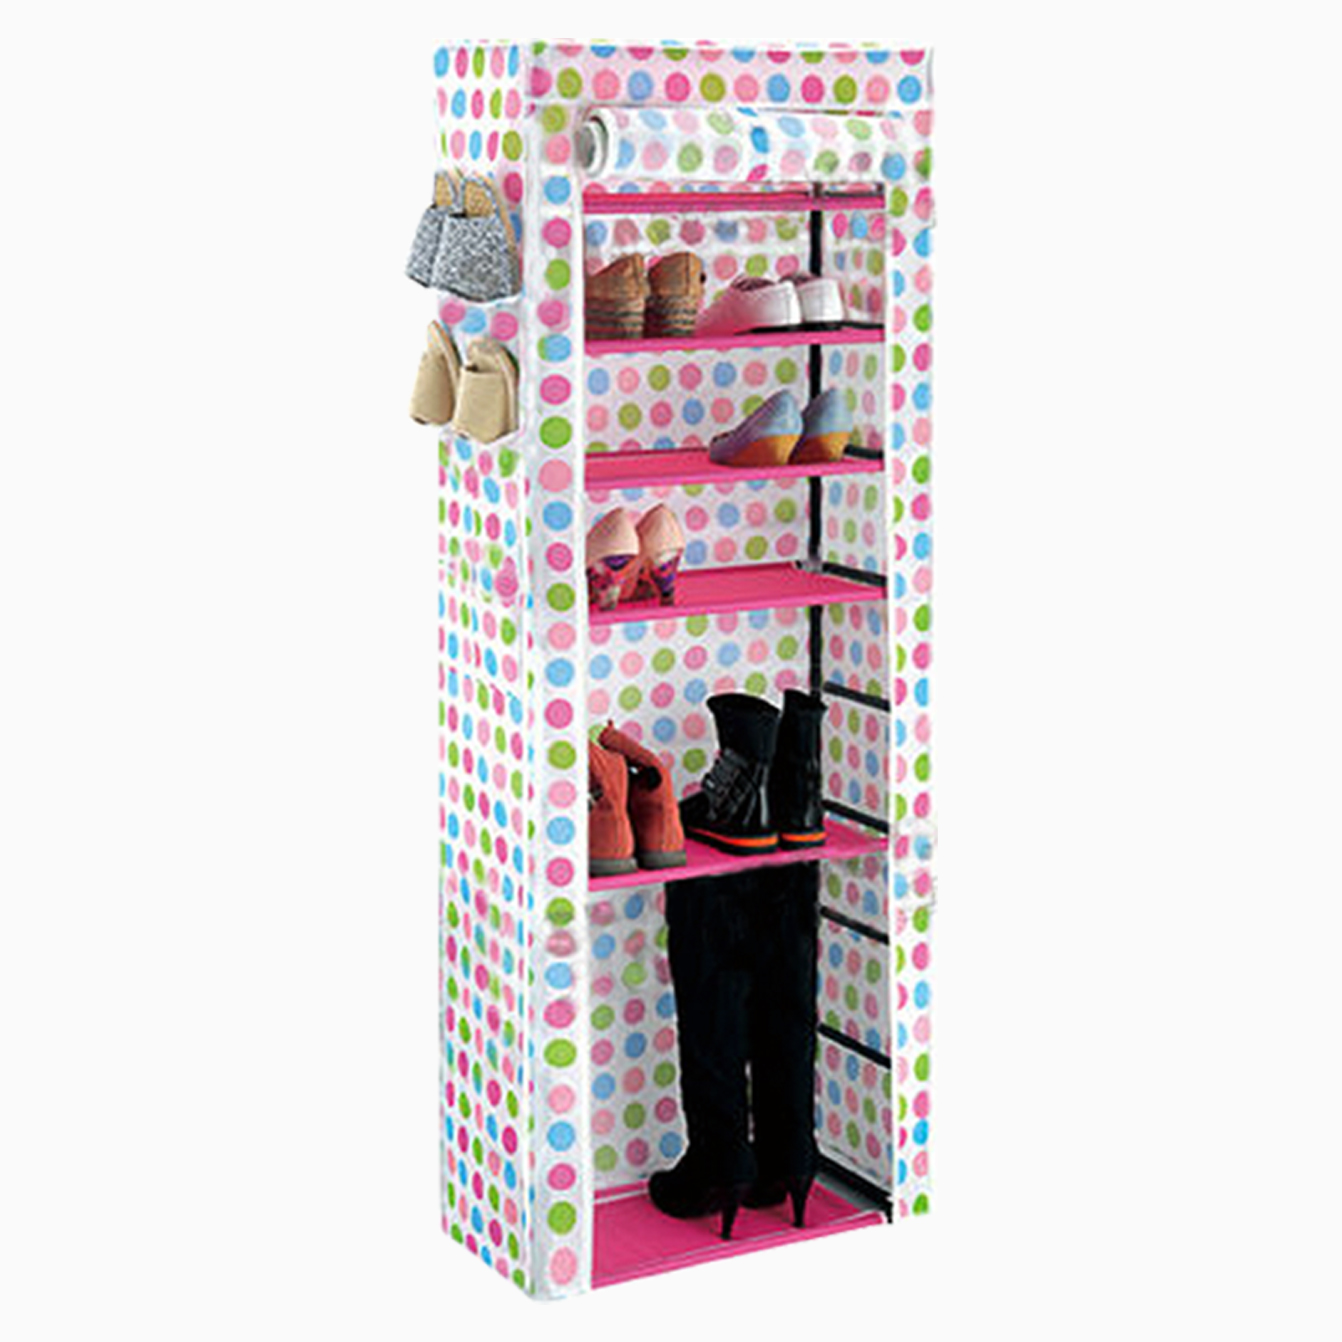 10tier toile tissu porte chaussure chaussures organisateur meuble rangement ebay. Black Bedroom Furniture Sets. Home Design Ideas